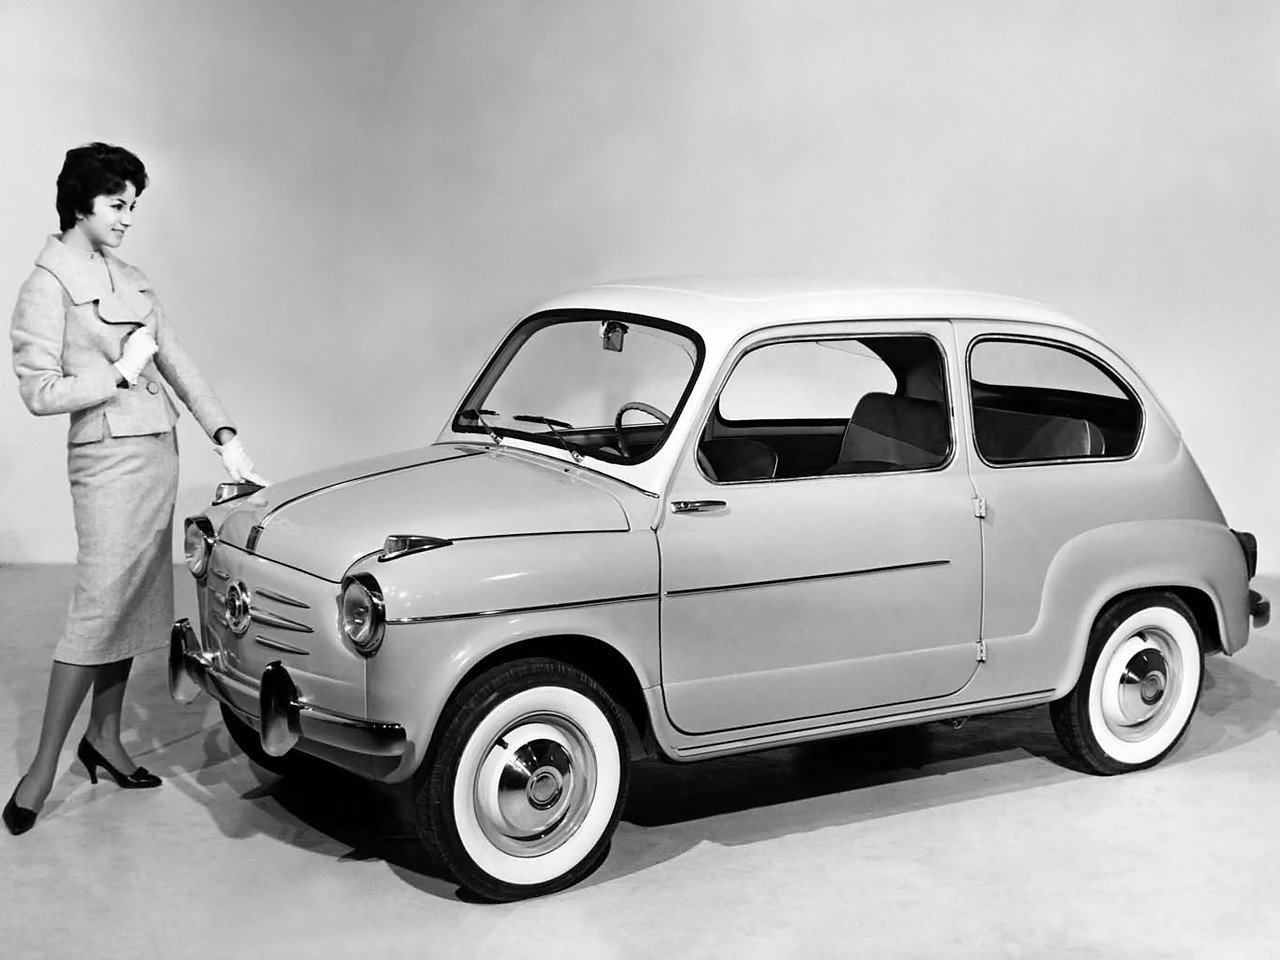 FIAT 600 specs & photos - 1955, 1956, 1957, 1958, 1959, 1960, 1961, 1962, 1963, 1964, 1965, 1966 ...